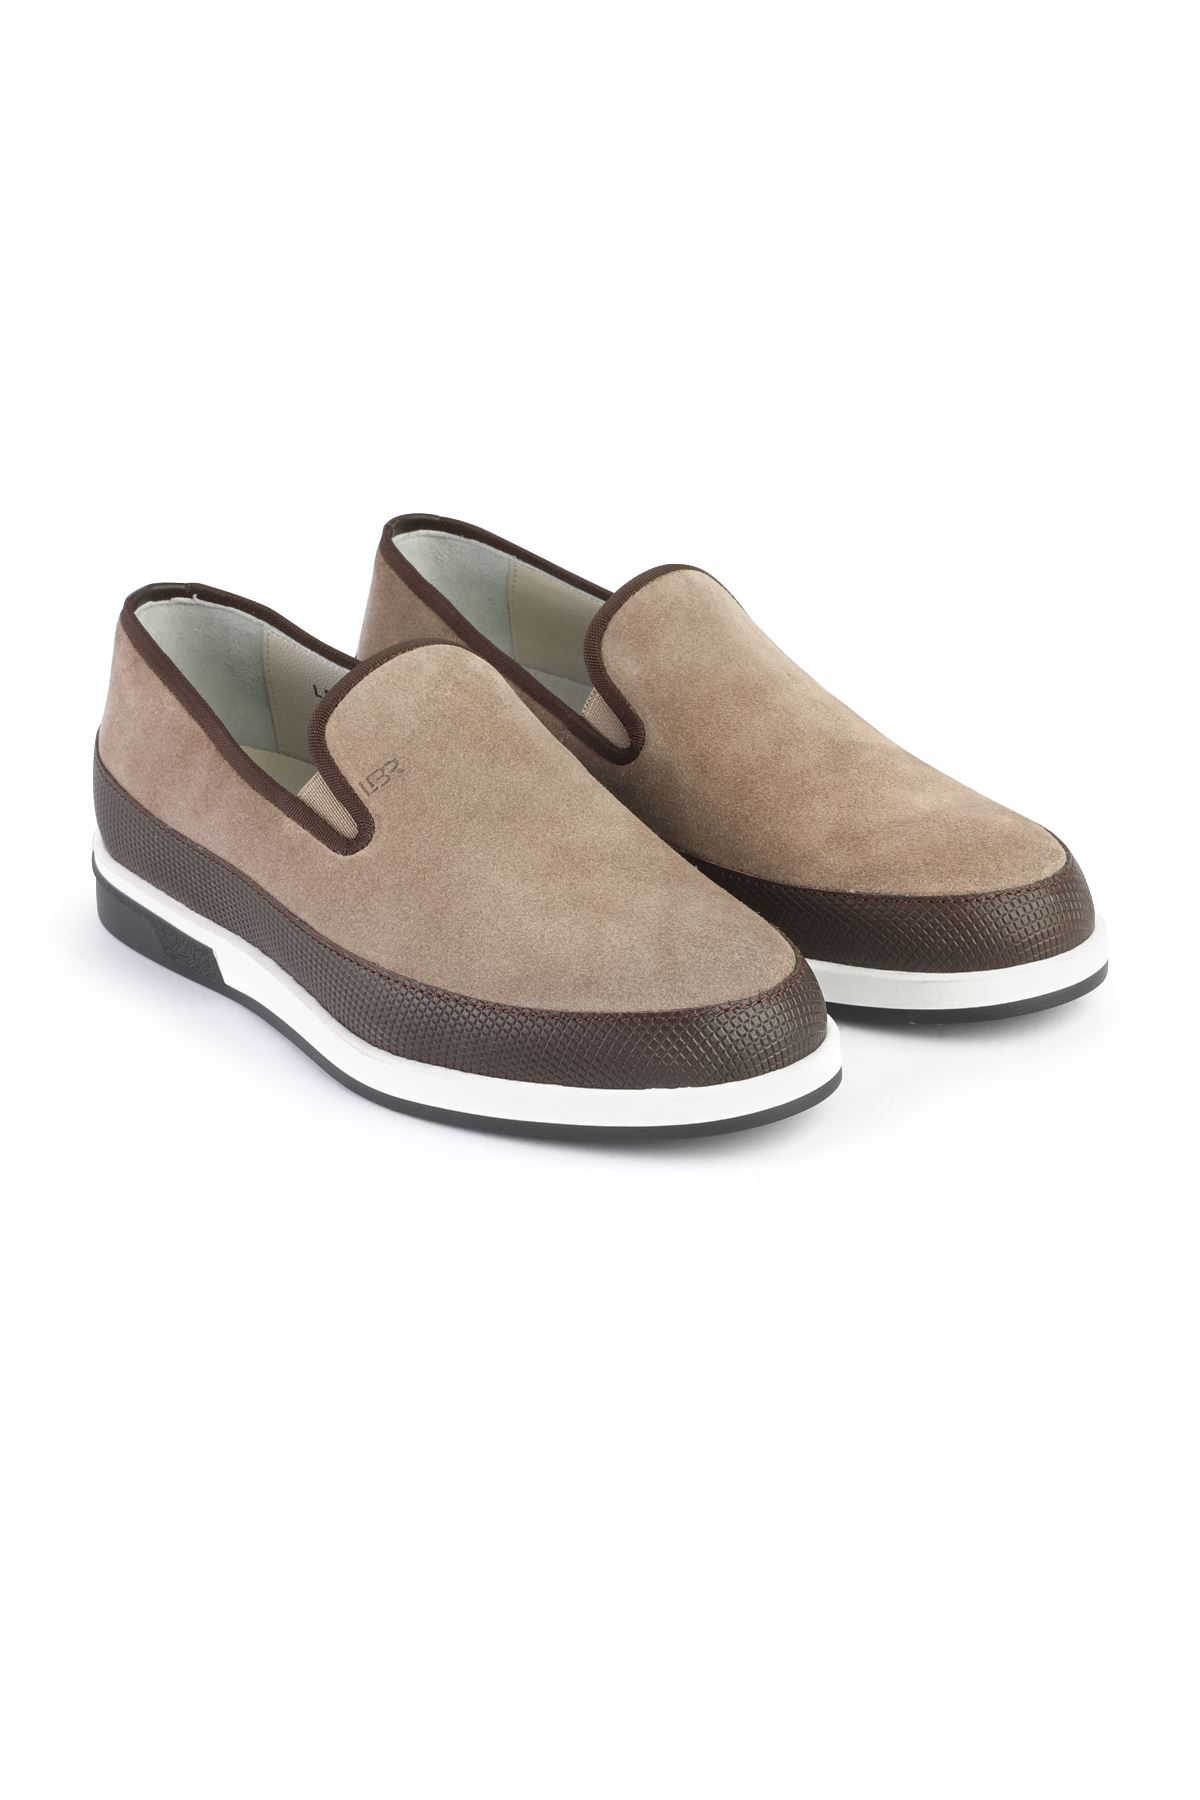 Libero 3368 Mink Loafer Shoes